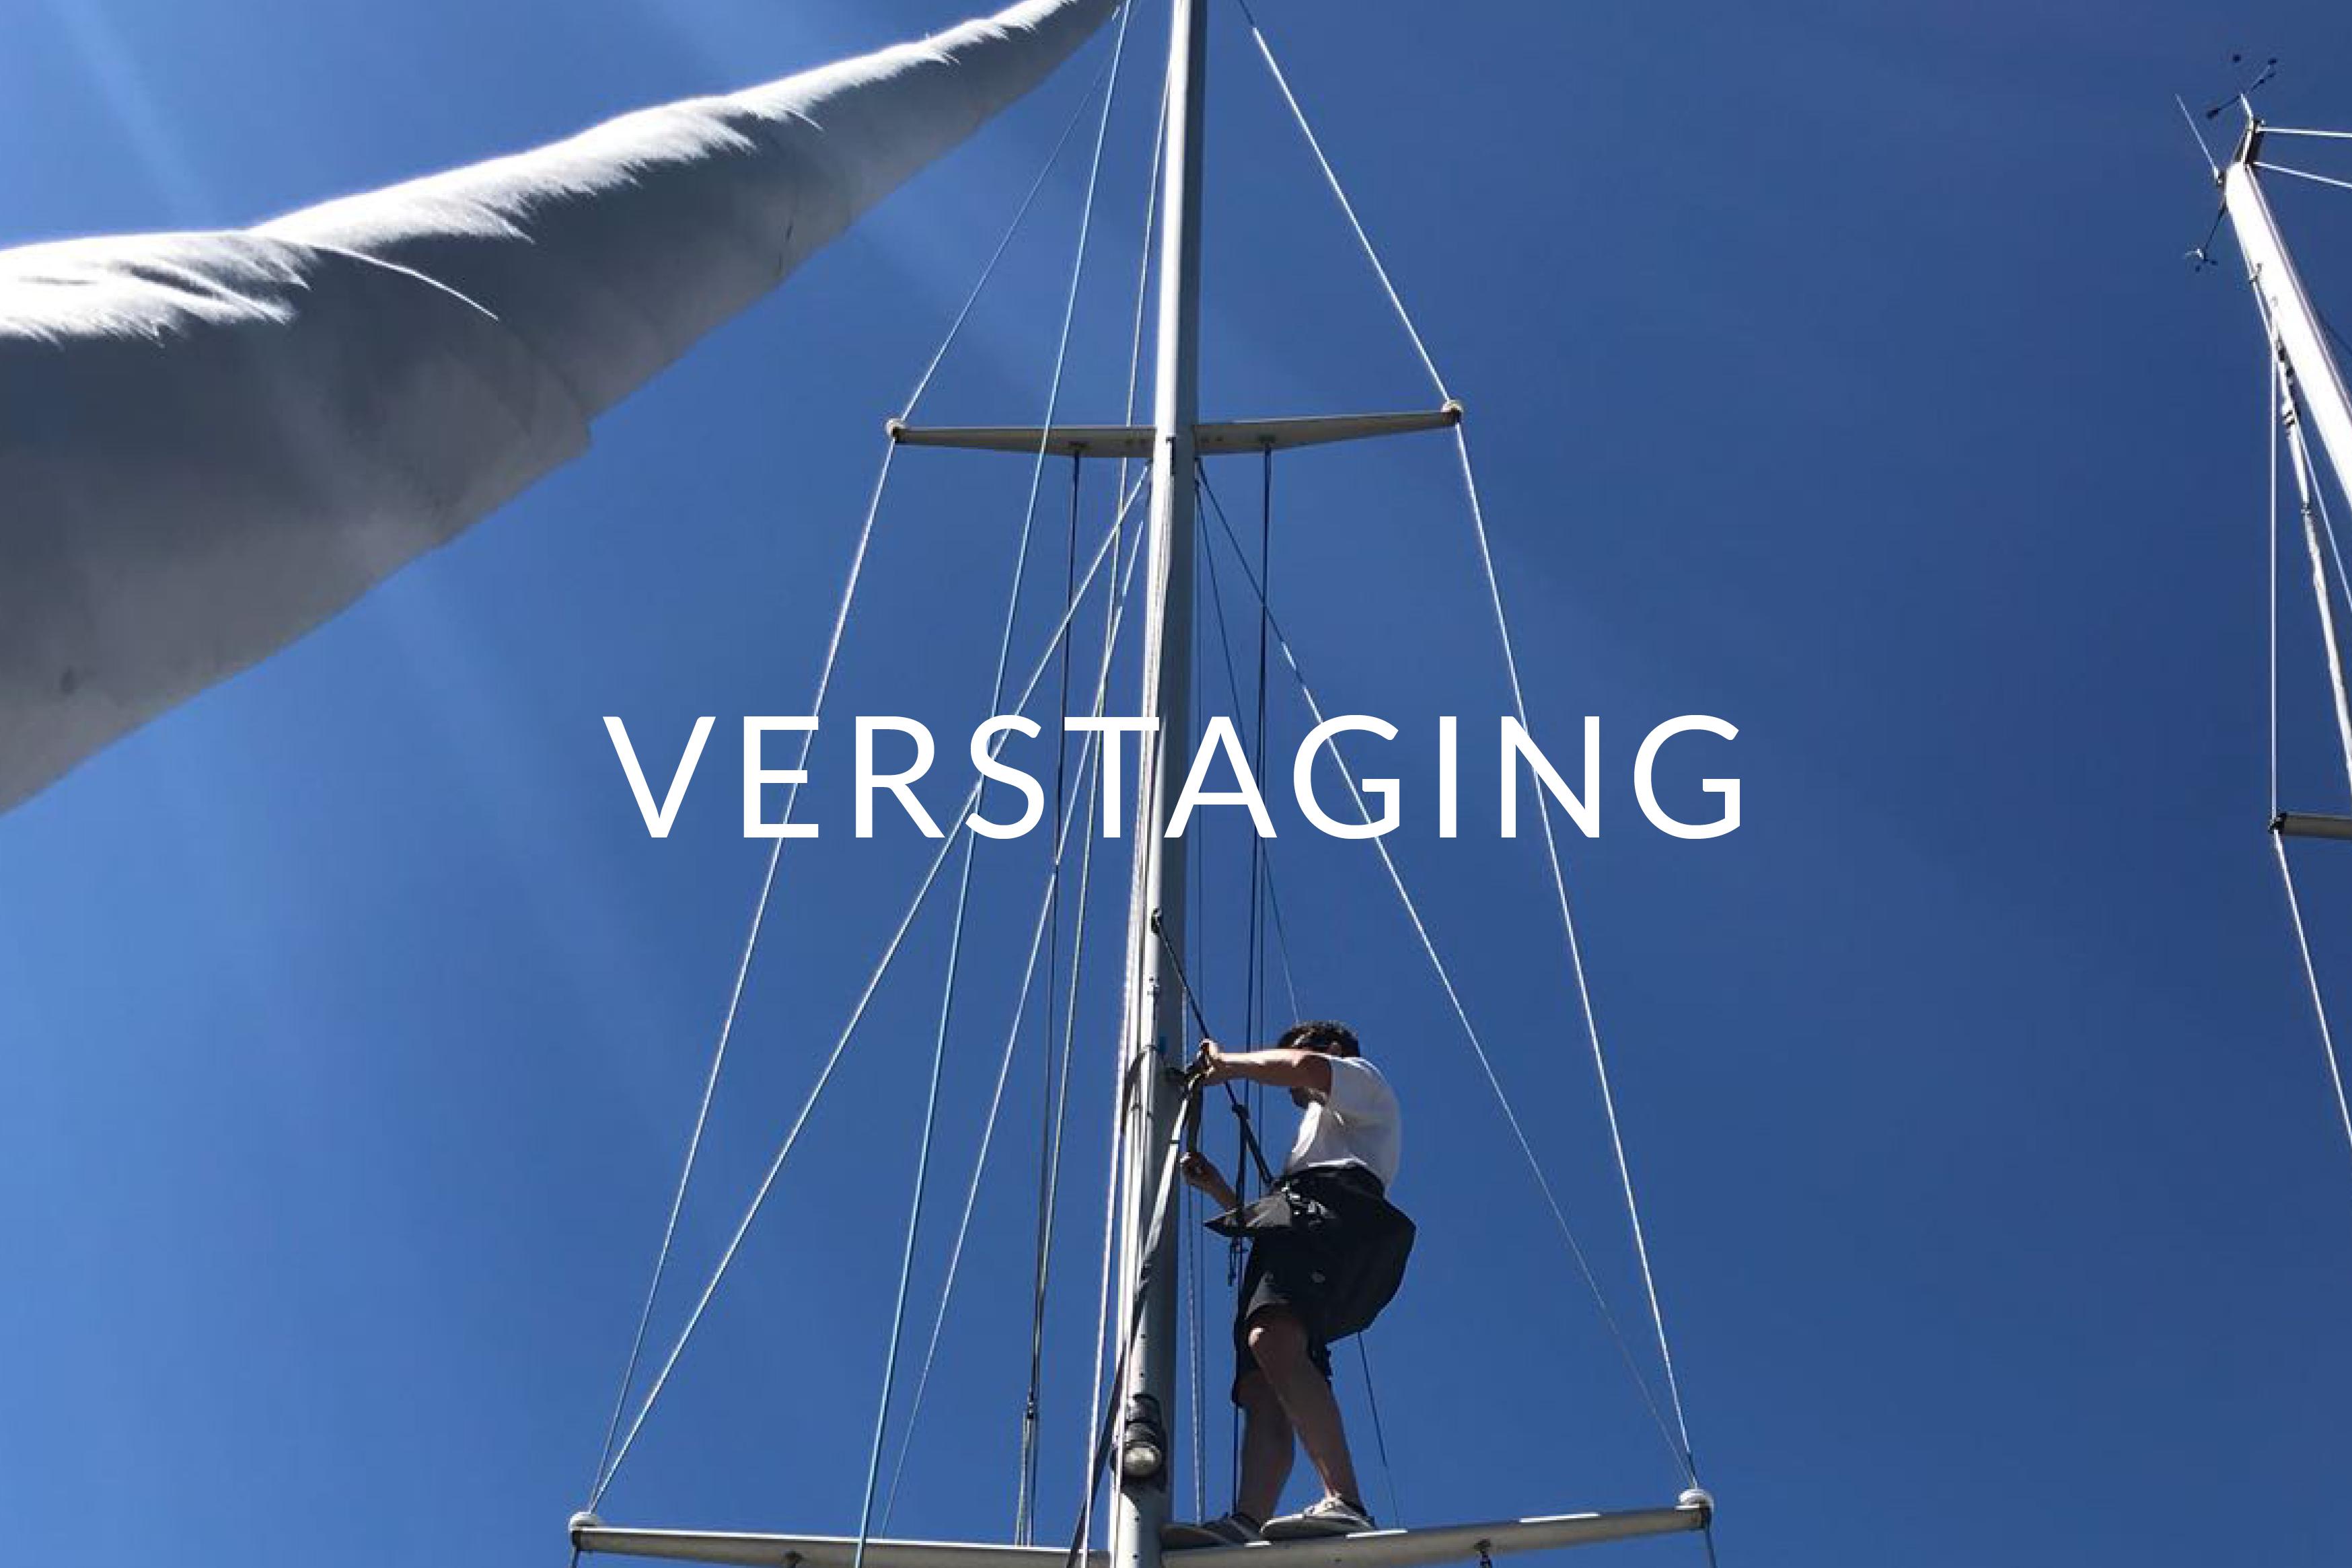 Webshop Verstaging - CS.RIGGING